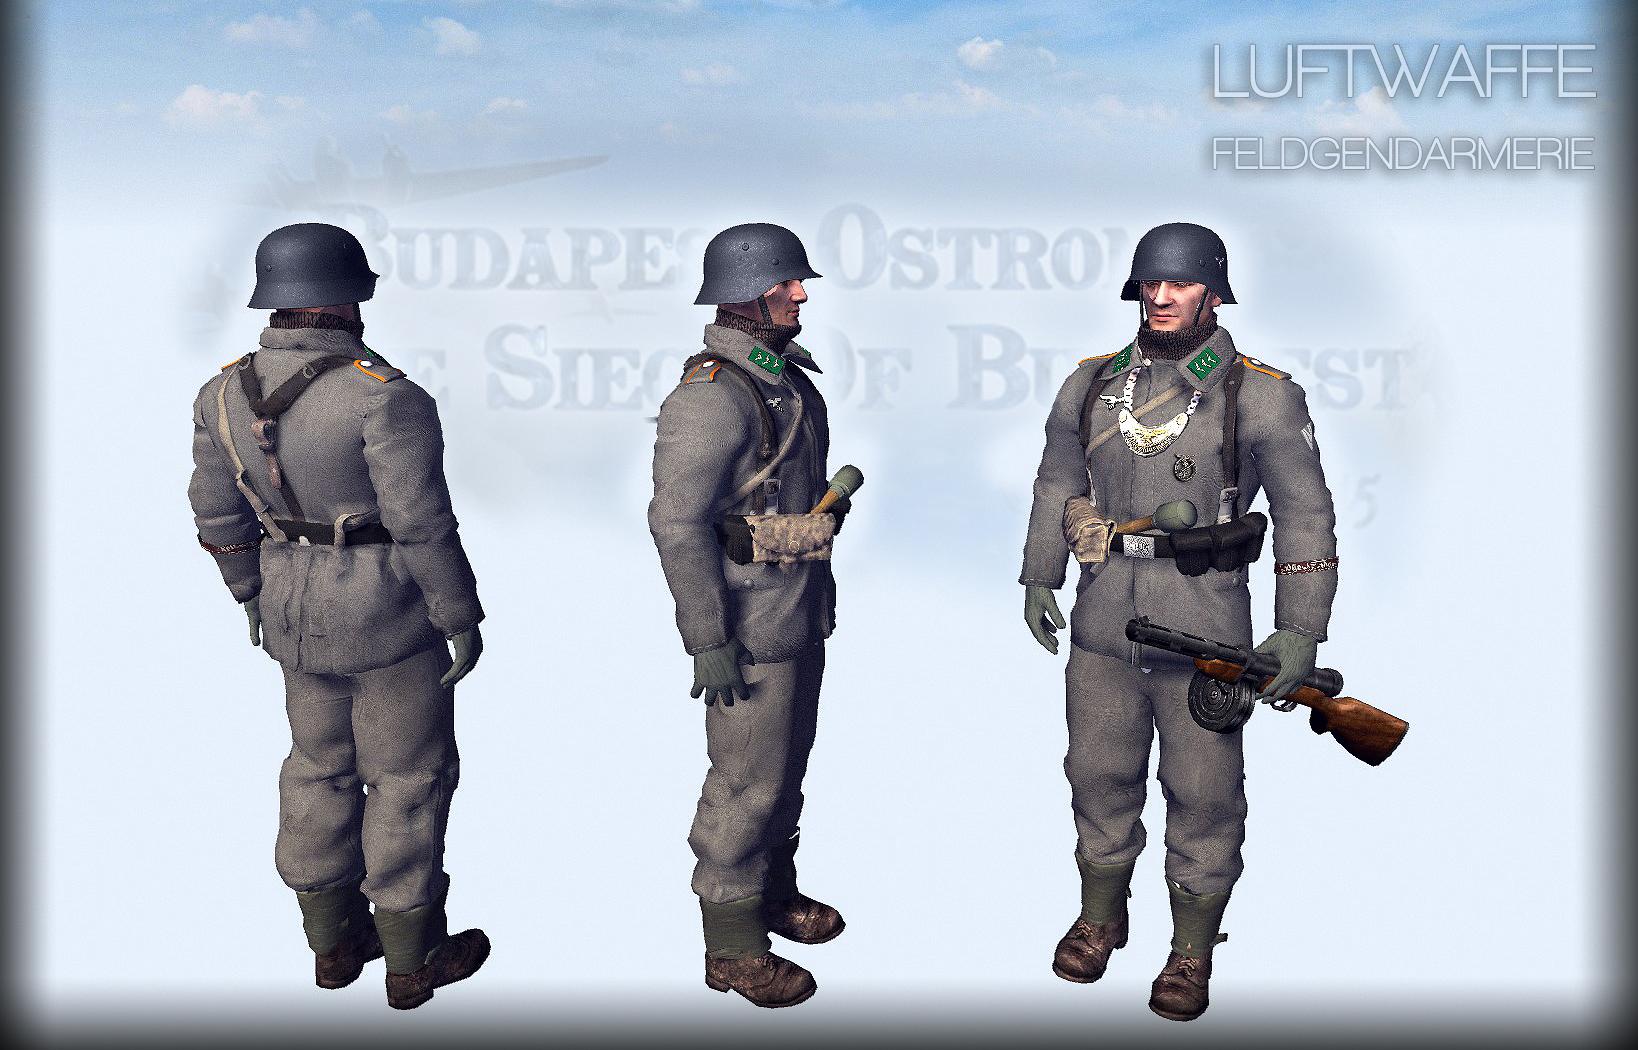 luftwaffe feldgendarmerie,Budapest ostroma 1945,Jatek